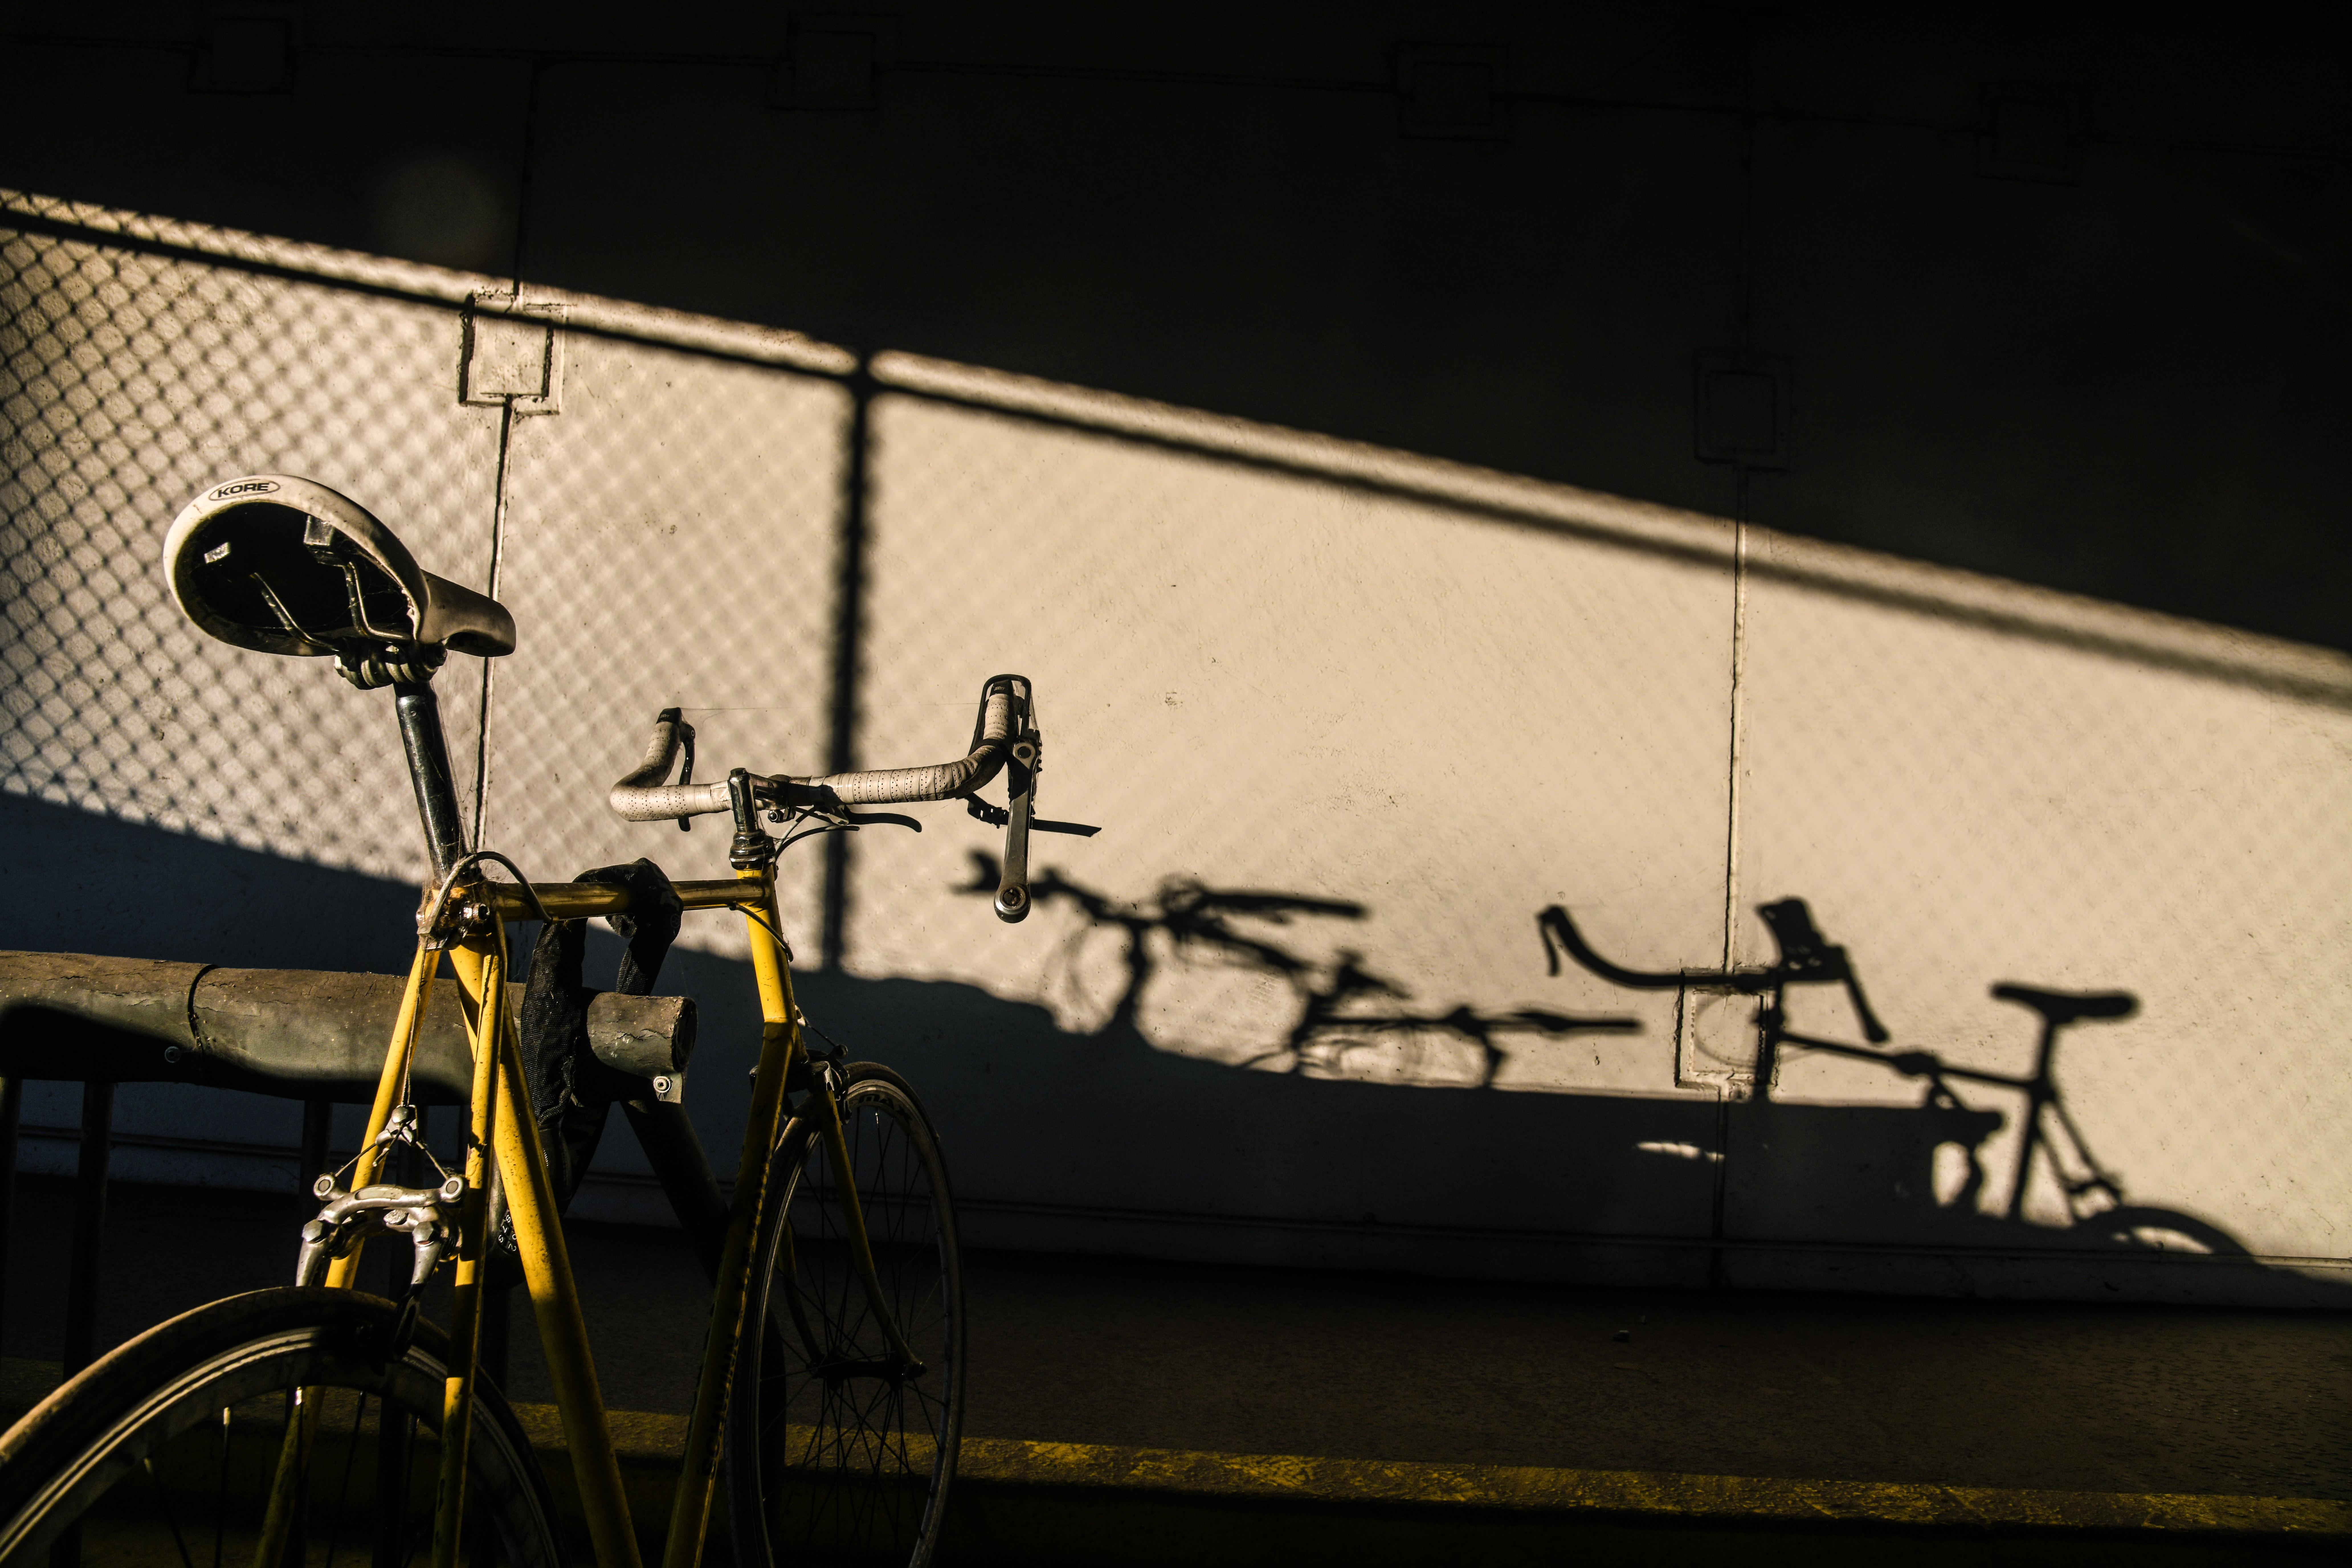 80b15bb029d A vintage Schwinn road bike catches the late afternoon sun in a parking  garage, Thursday